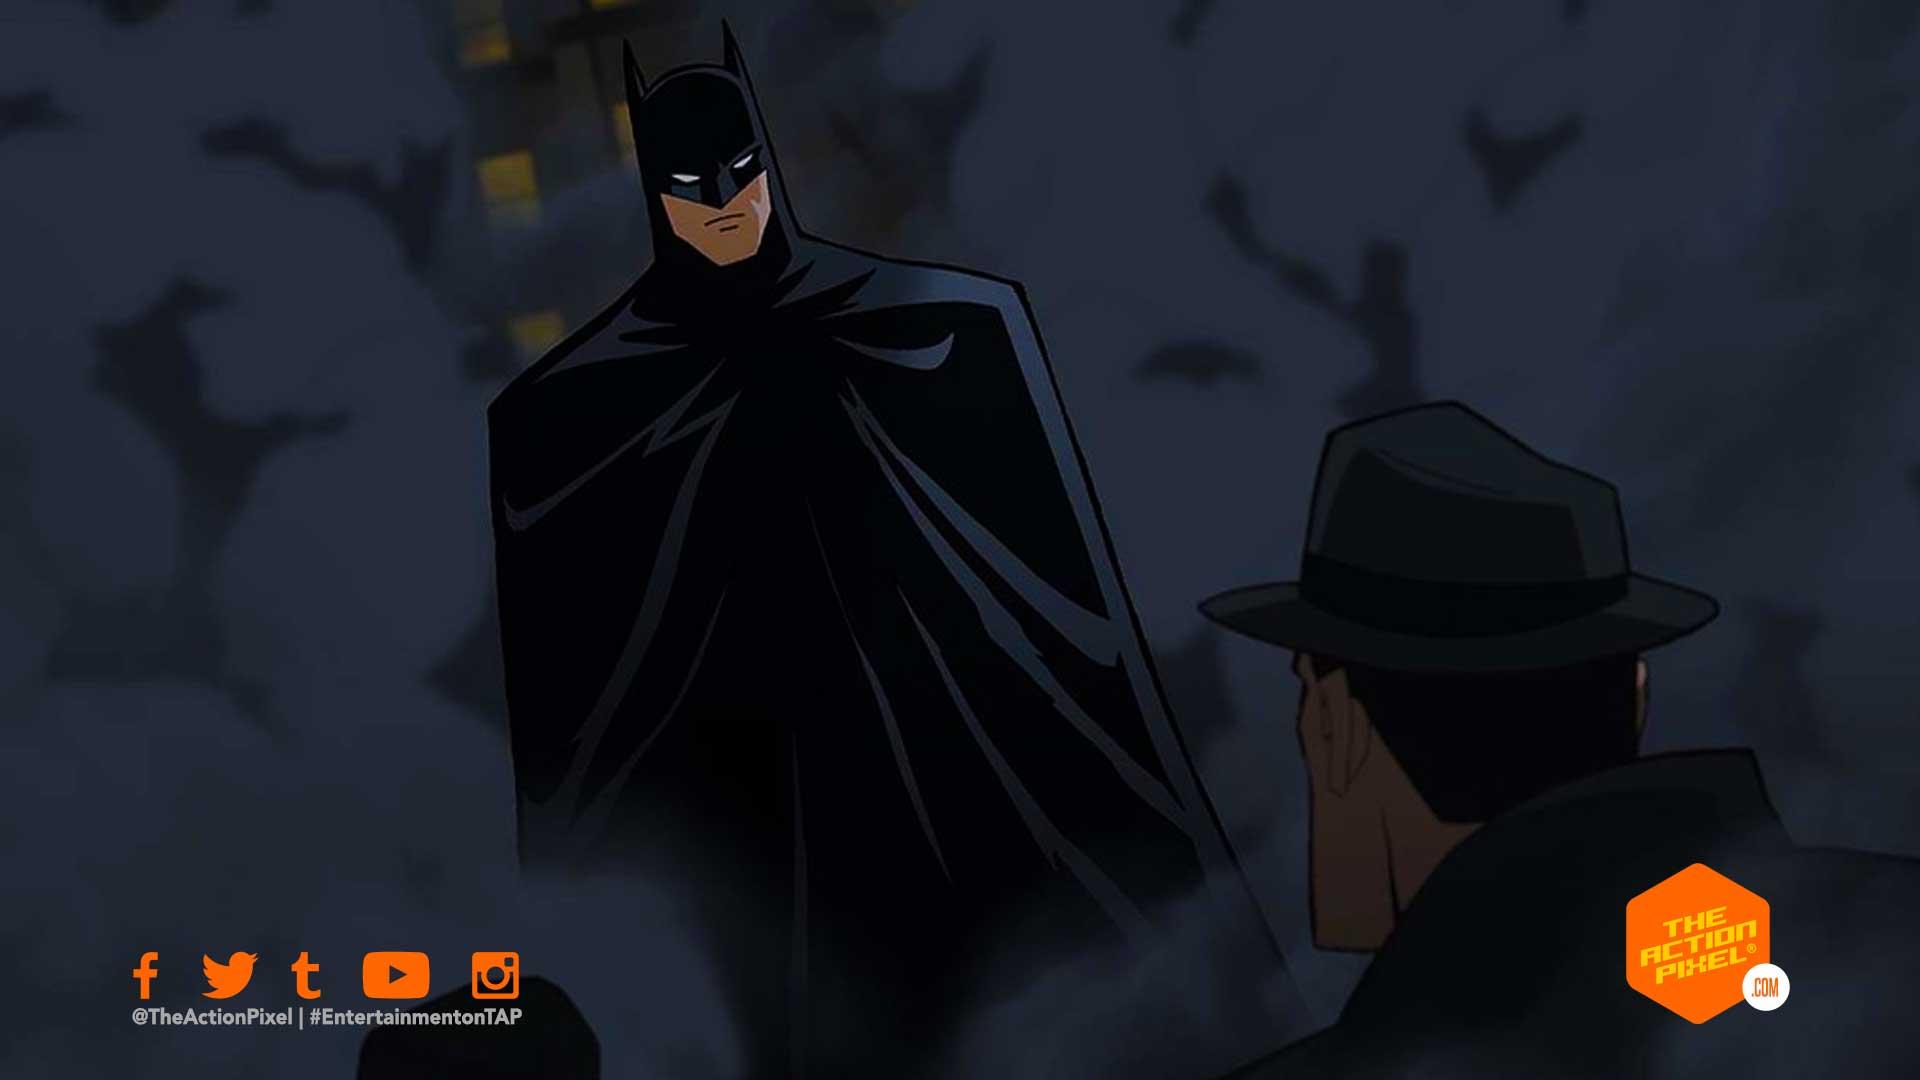 Jensen Ackles, batman, dc comics, wb animation, batman the long halloween, batman the long halloween part 1, batman: the long halloween part 1, batman the long halloween animation, batman, the long halloween,Batman: the long halloween,Naya Rivera ,,Catman,Selina Kyle, Josh Duhamel , Harvey Dent, Billy Burke , James Gordon,